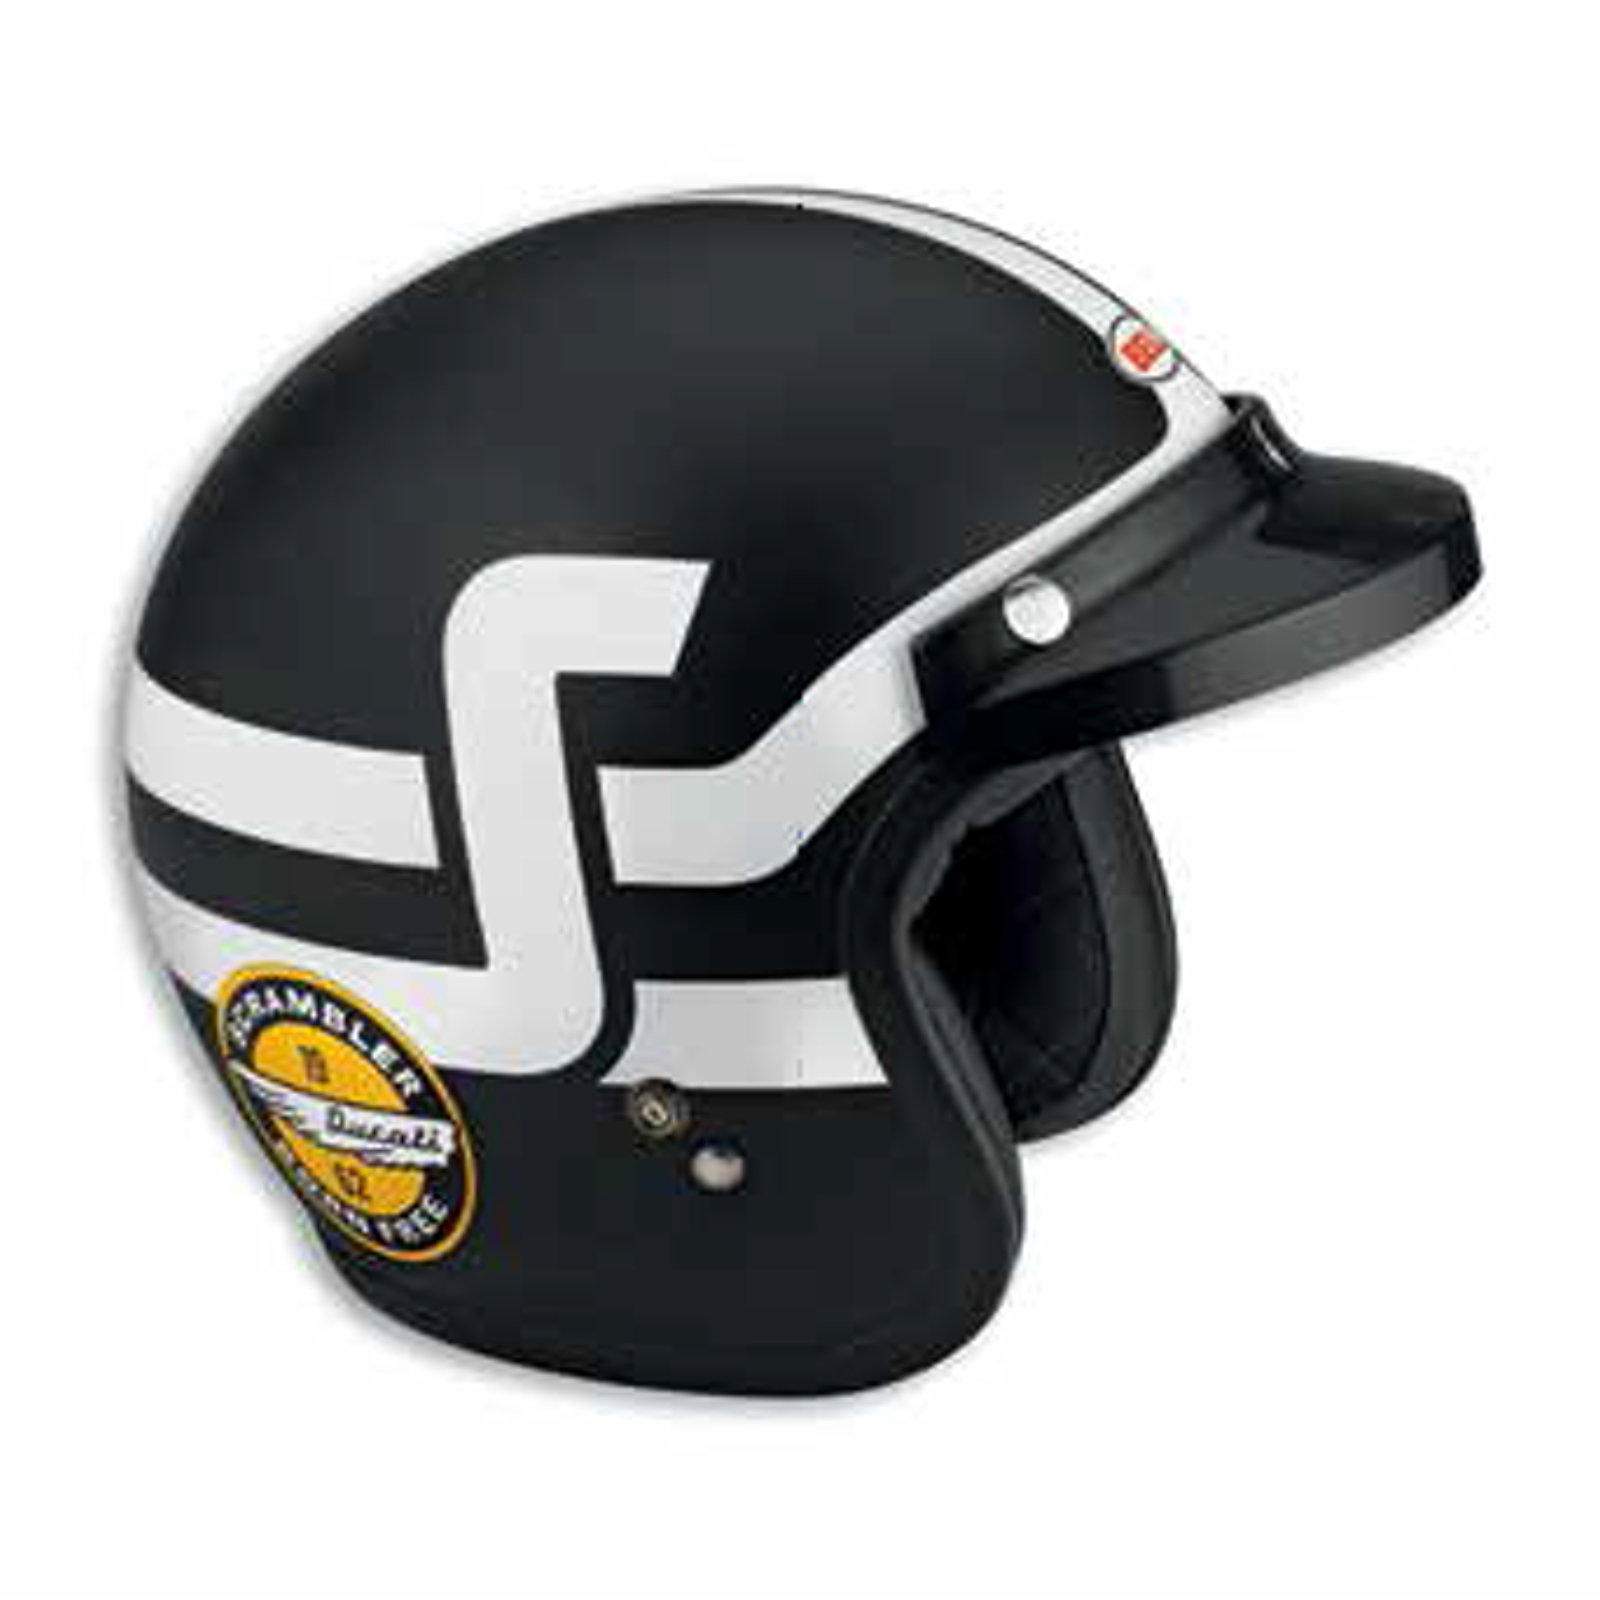 Bell Ducati Scrambler Helmet